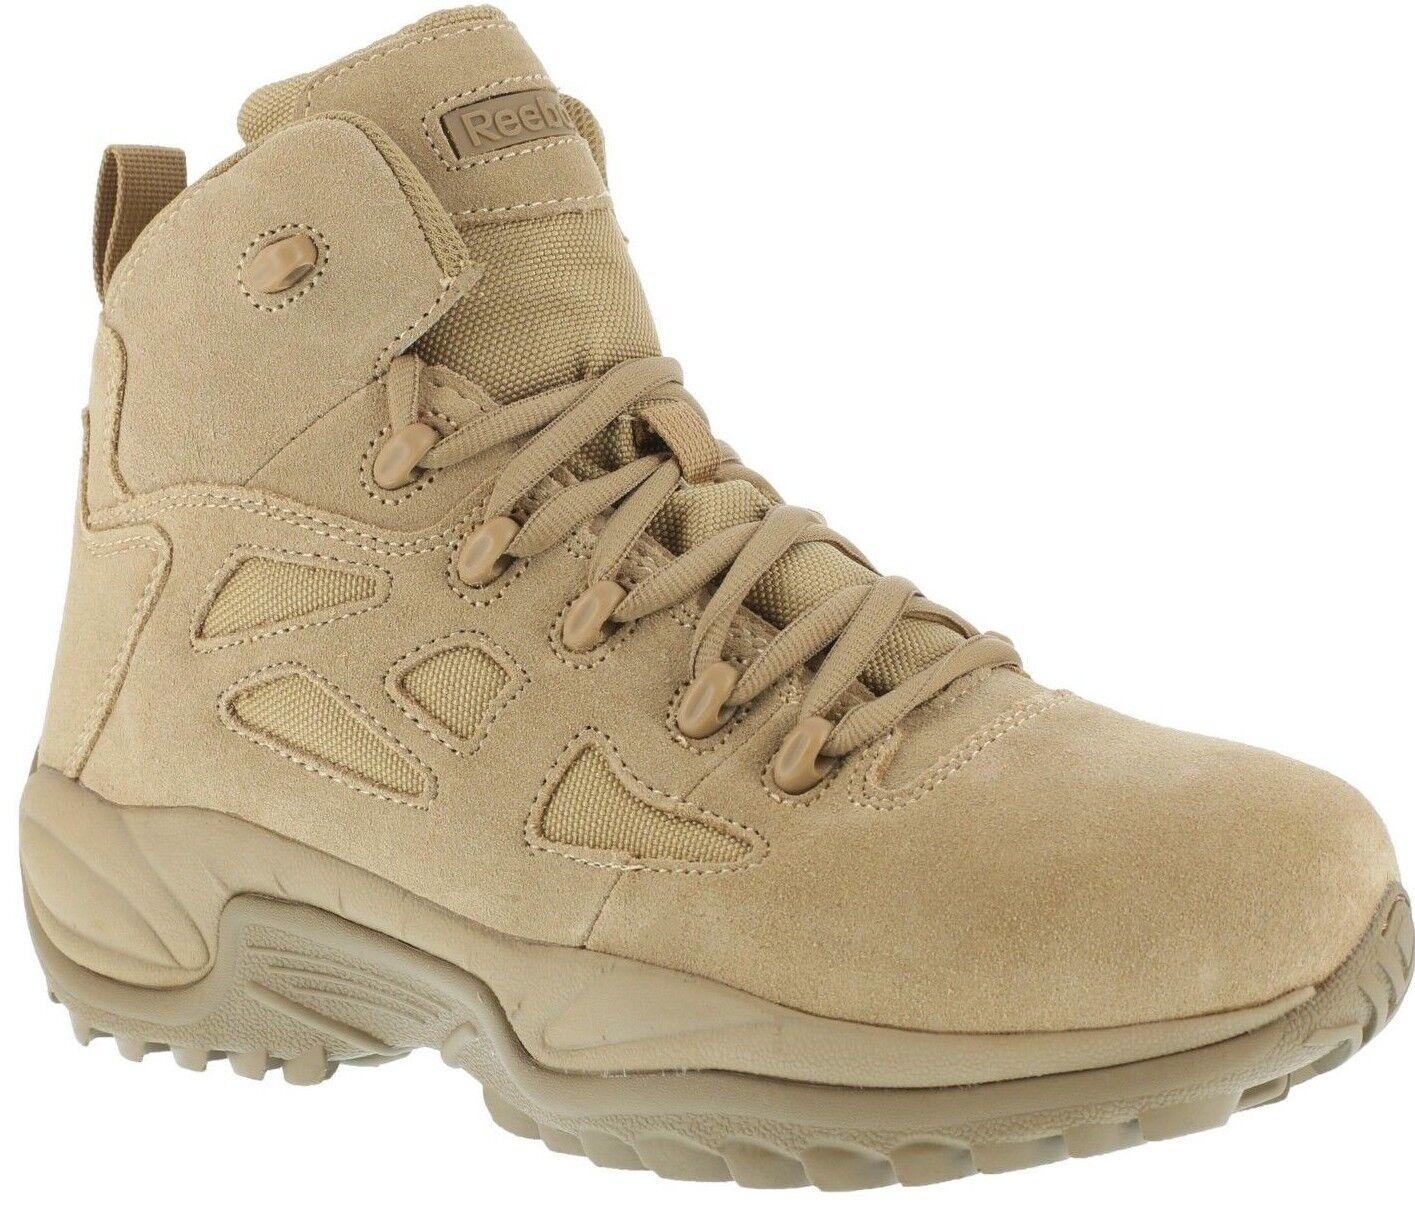 Reebok RB8694 Mens Desert Tan 6 6 6  EH Side-Zip Comp Toe Tactical Stiefel Cushioned 66e81e